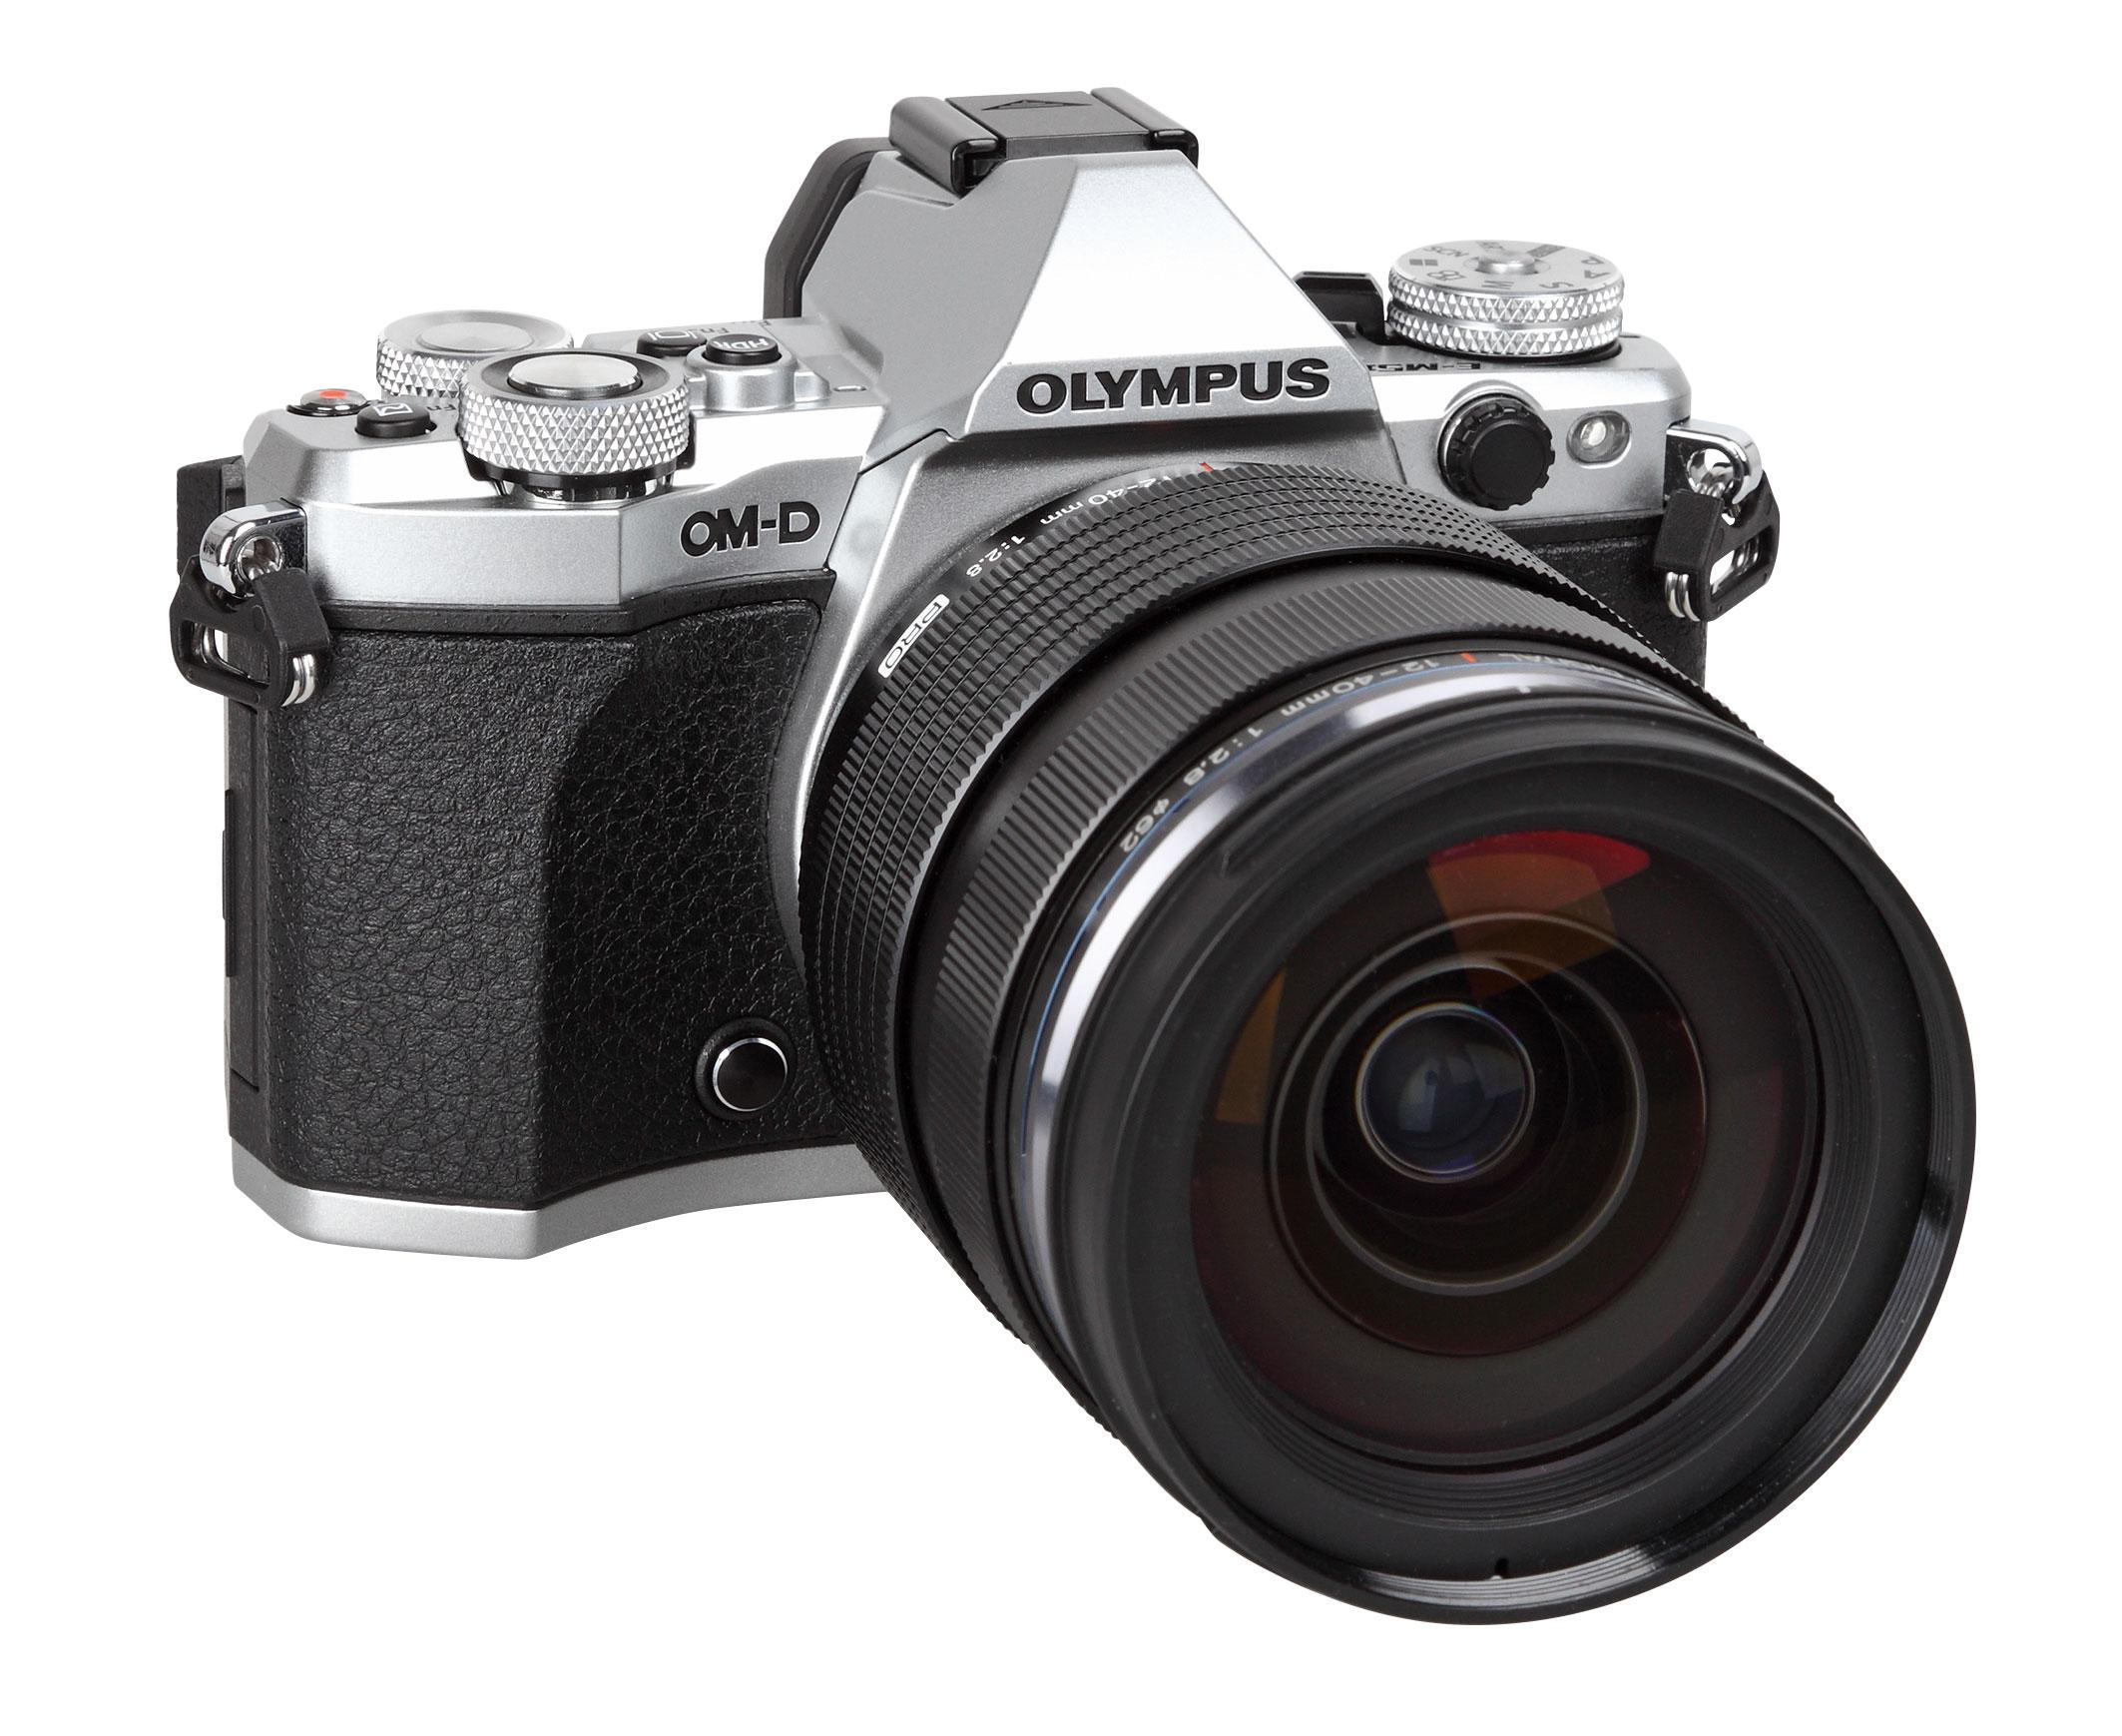 Kameratest Olympus OM-D E-M5 Mark II